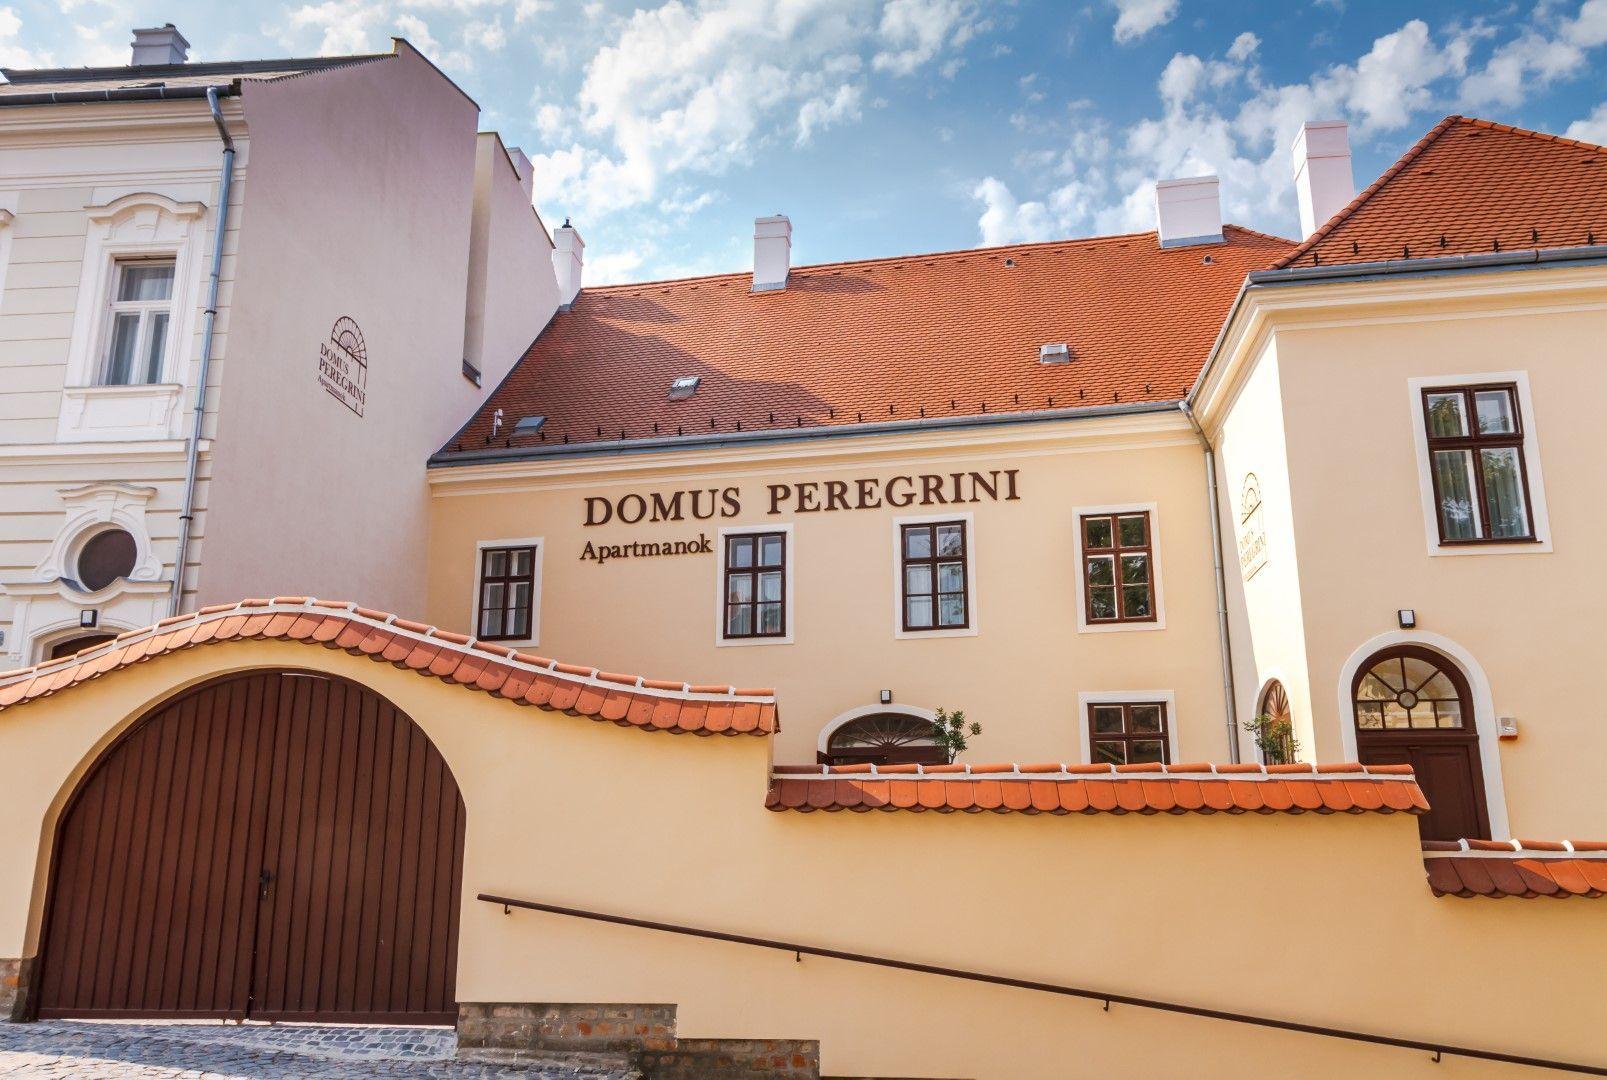 <a href='http://hellogyor.hu/en/accomodation/domus-peregrini-apartments/'>Domus Peregrini Apartments</a>